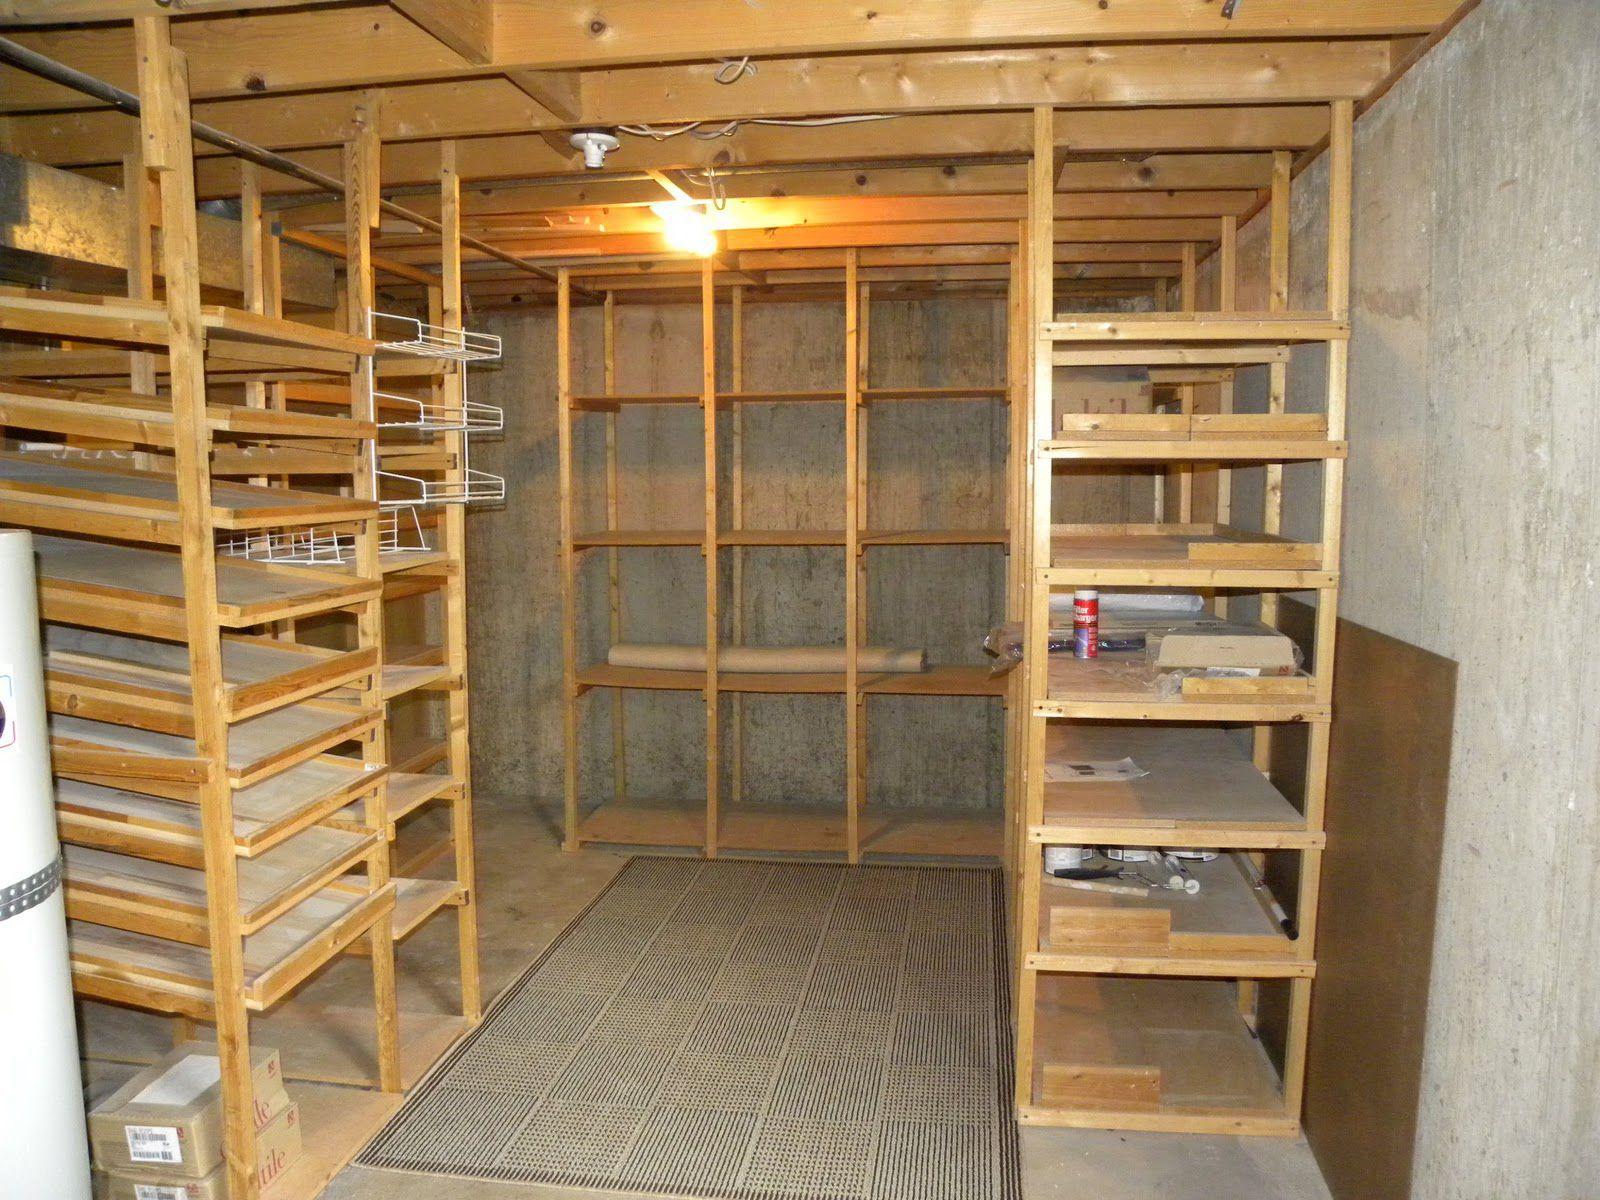 Basement storage room ideas duwetbasement